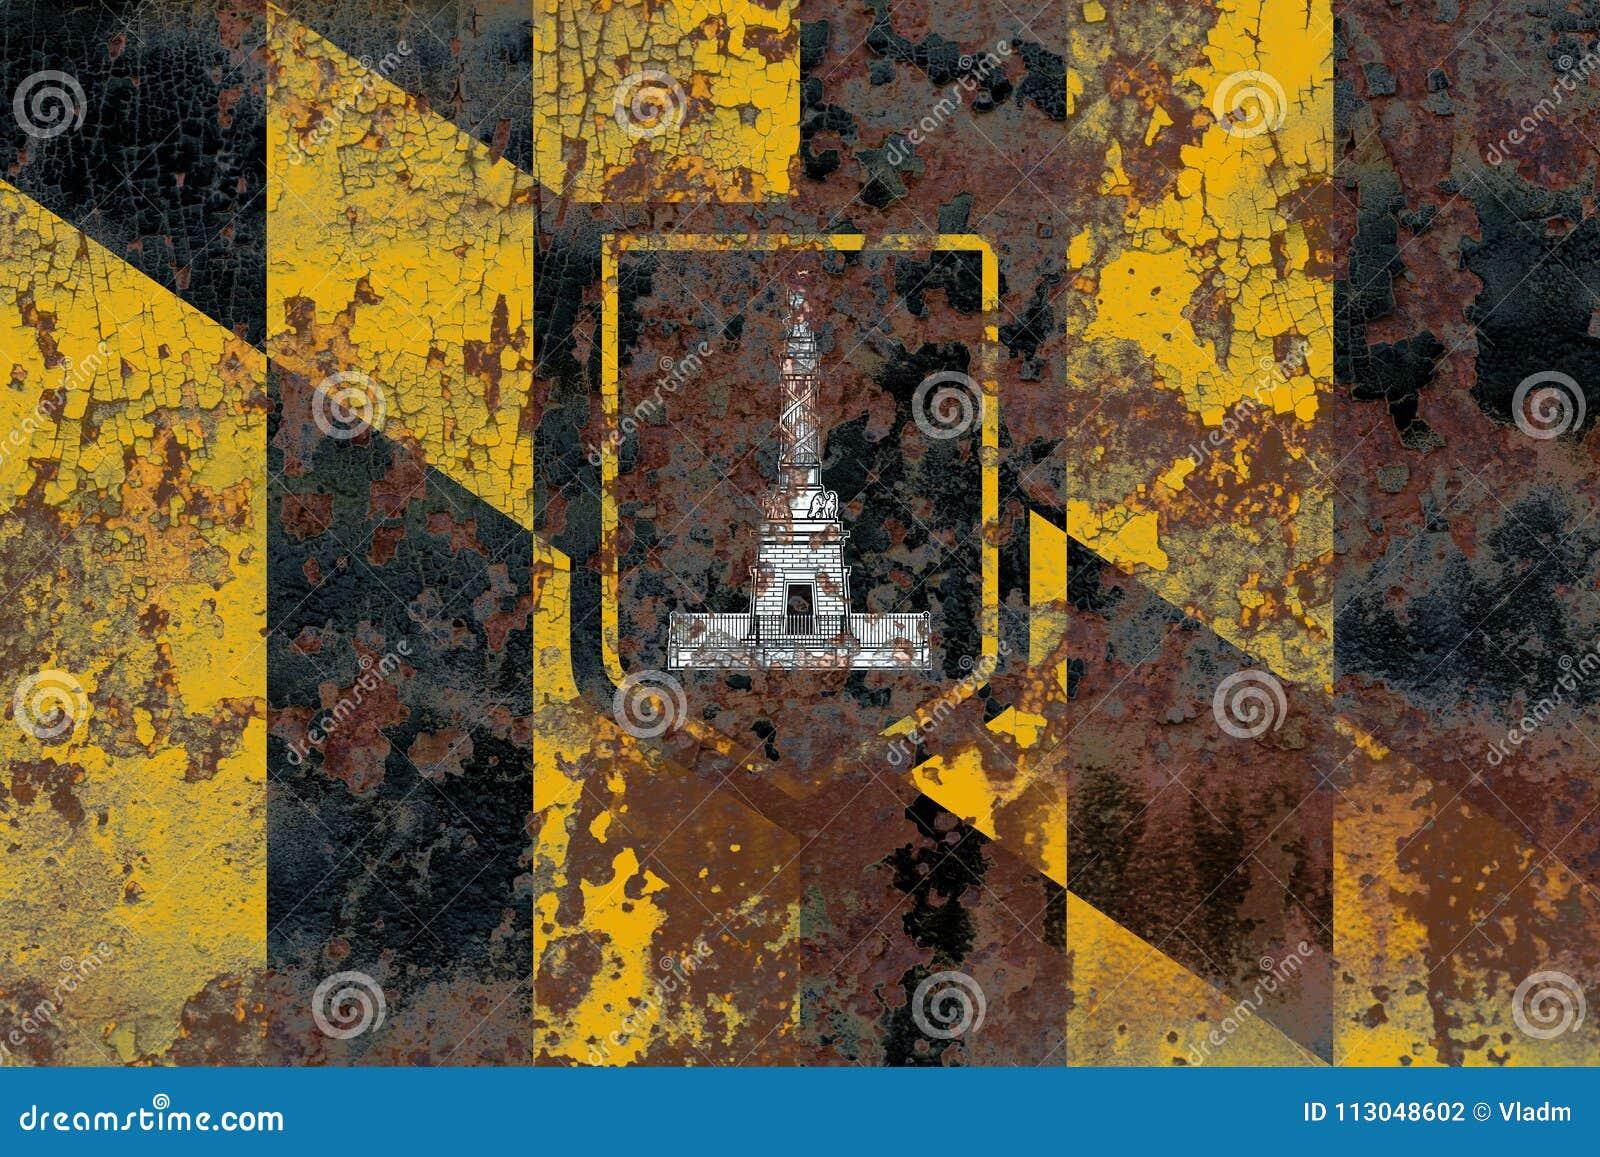 Baltimore city smoke flag, Maryland State, United States Of Amer